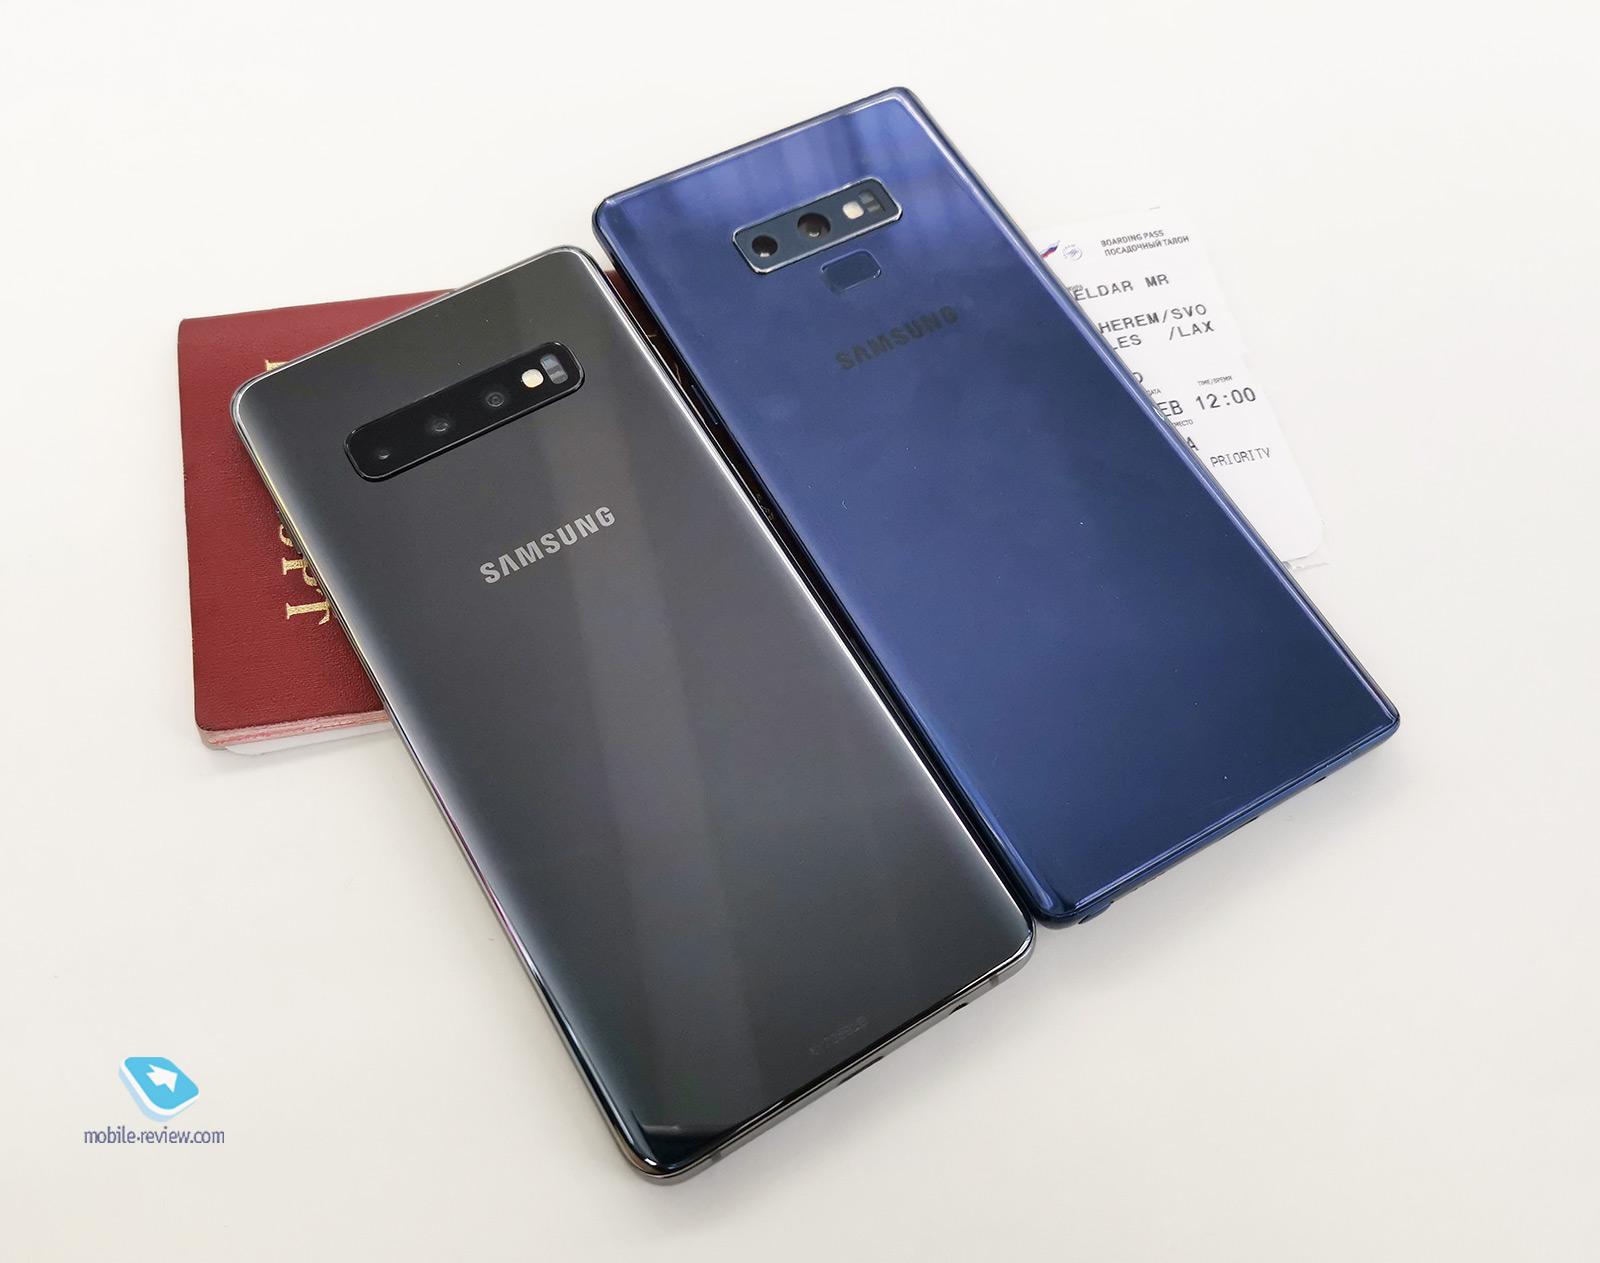 Samsung Galaxy S10 / S10 + (SM-G970F / G975F)